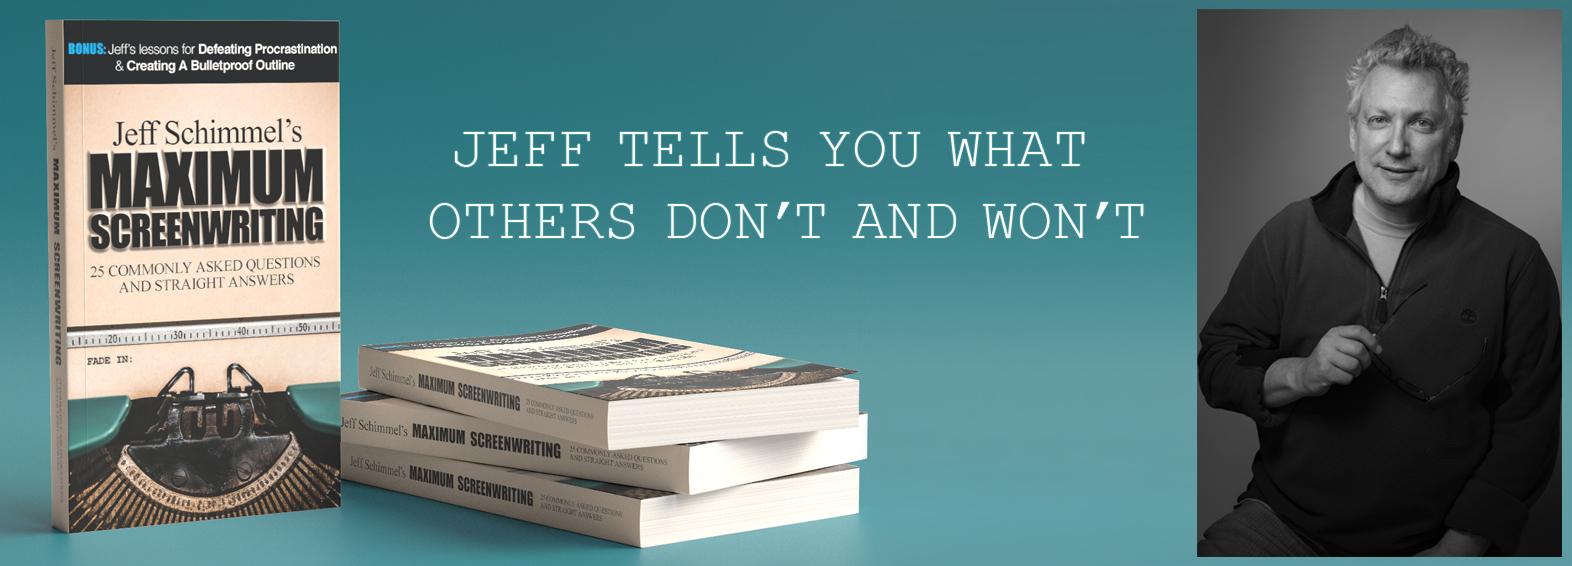 Jeff-Schimmel-Book-Header.jpg